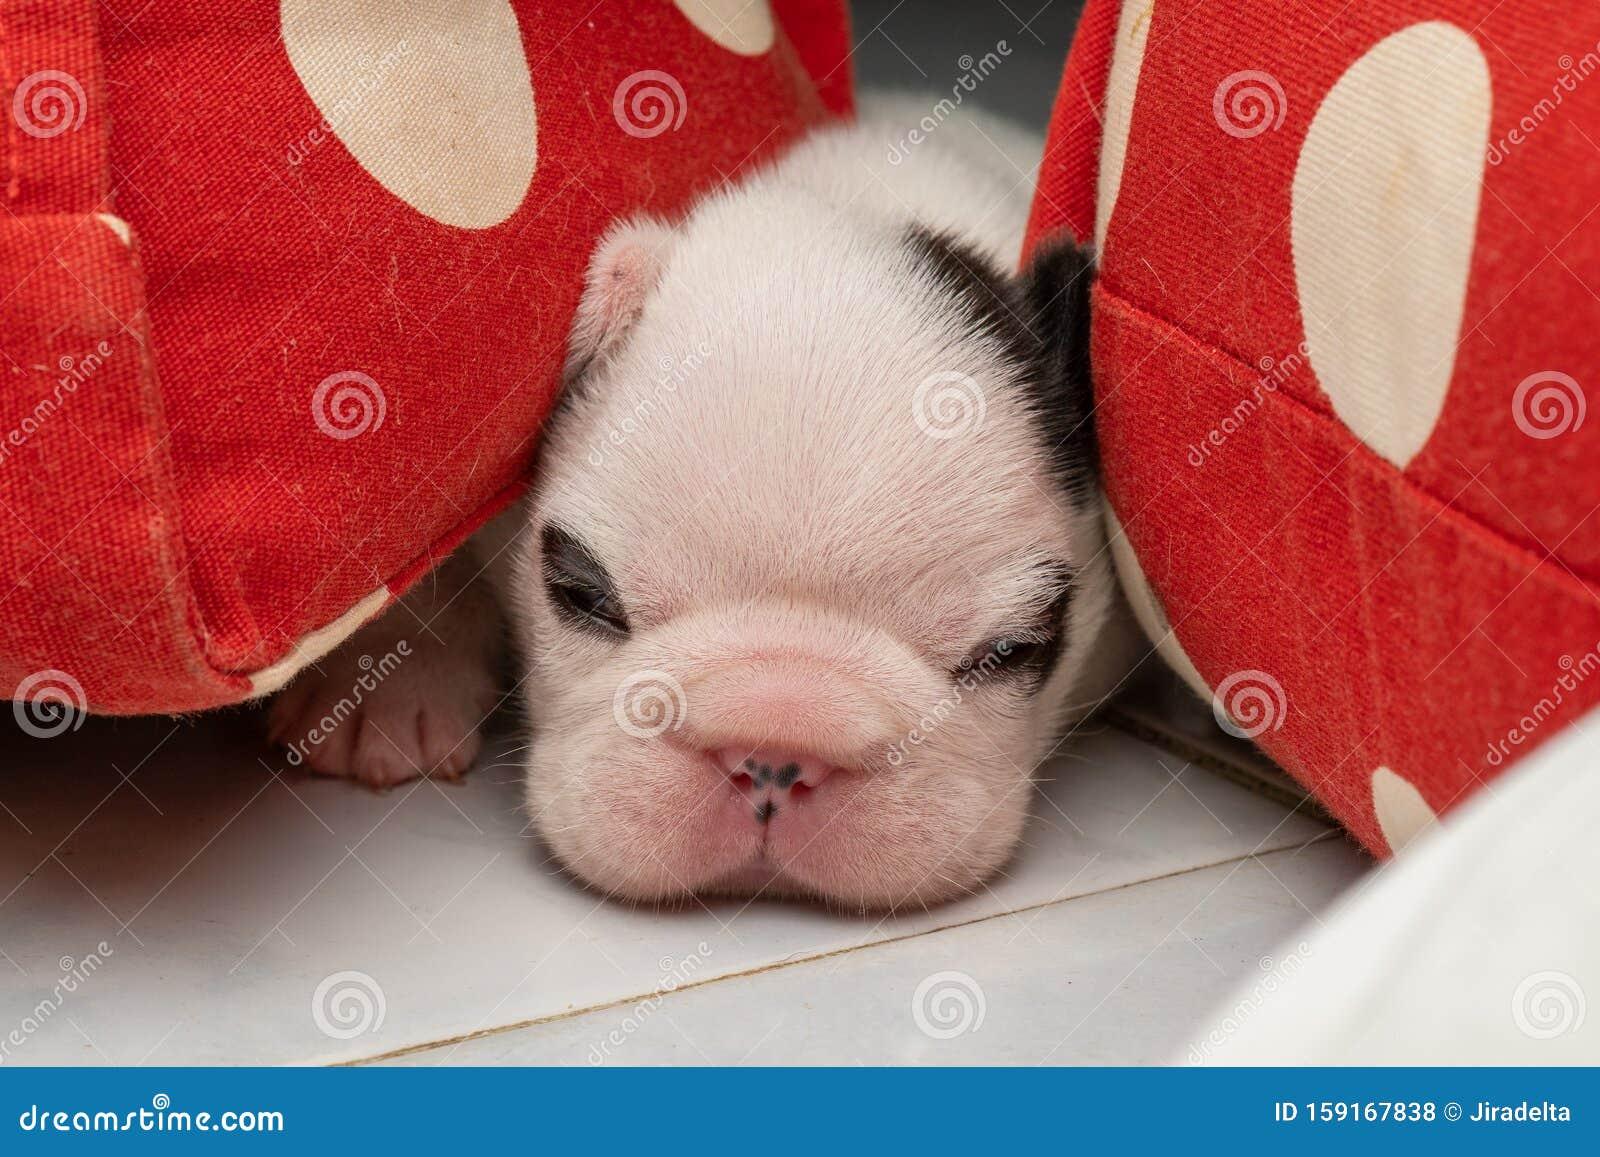 Black And White French Bulldog Puppy Sleeping On The Floor Stock Photo Image Of Animal Black 159167838